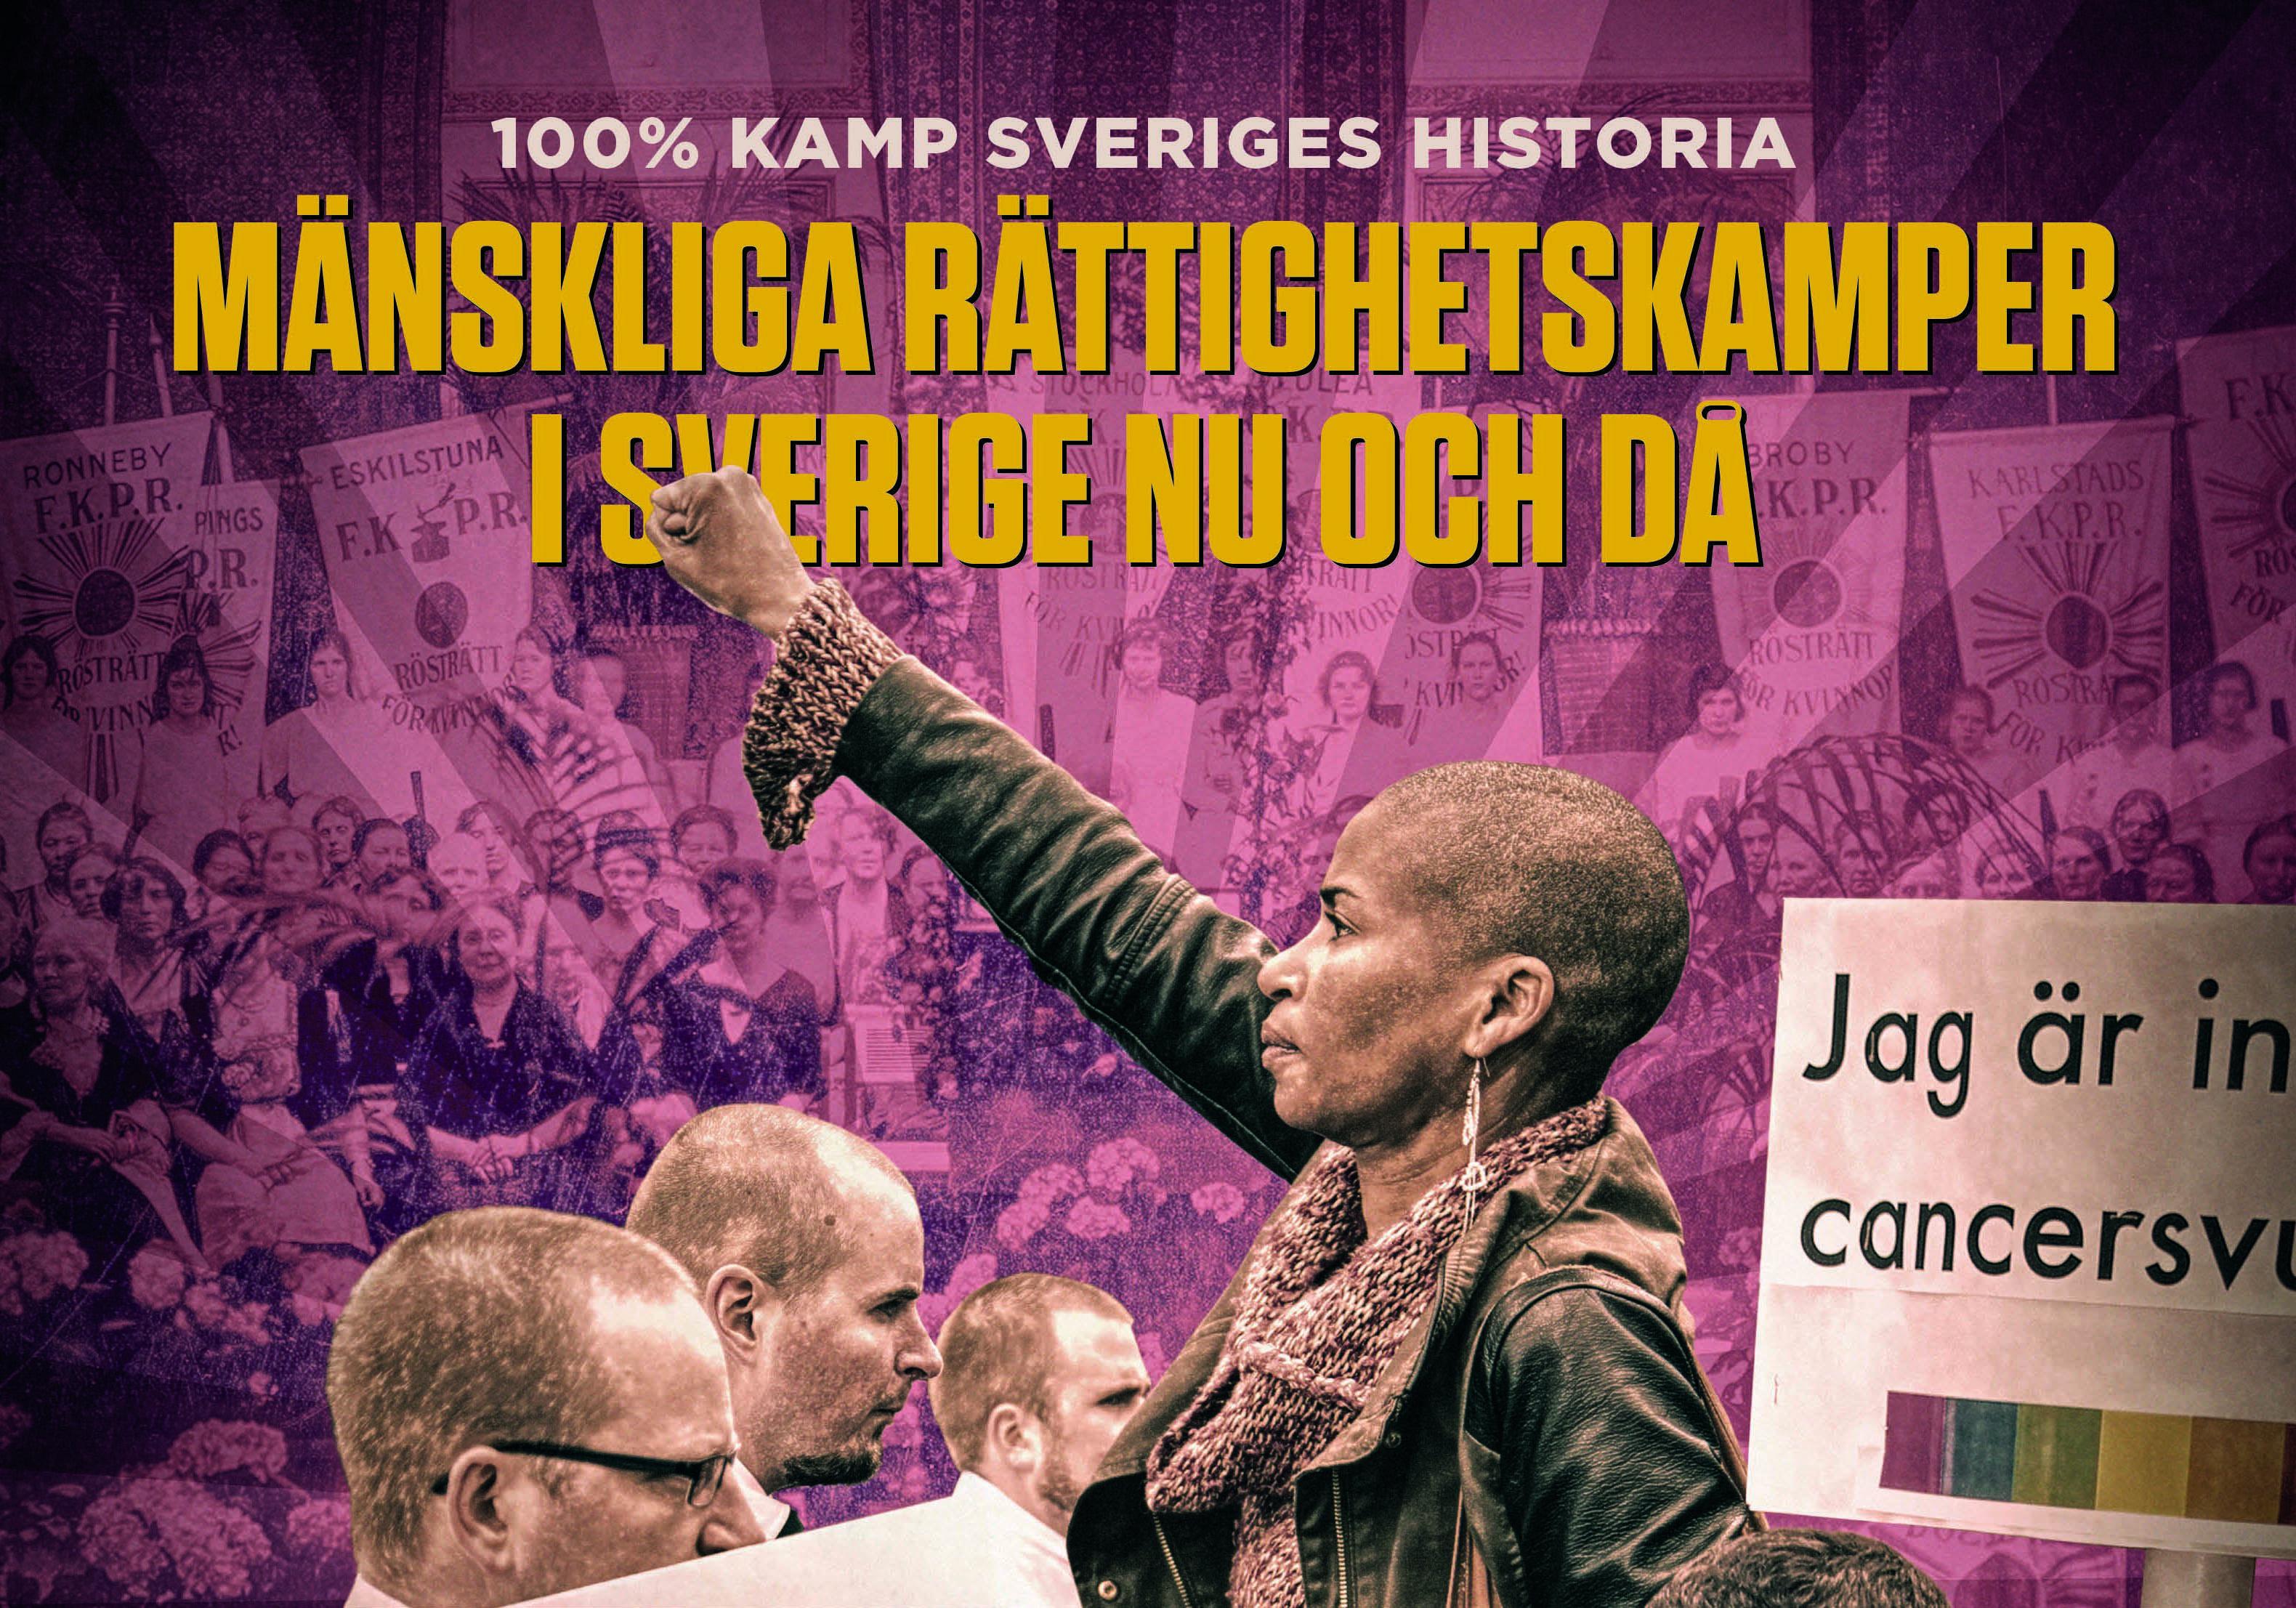 Omslag/Bildkollage: Kristofer Lönnå, 100% Kamp - Sveriges historia